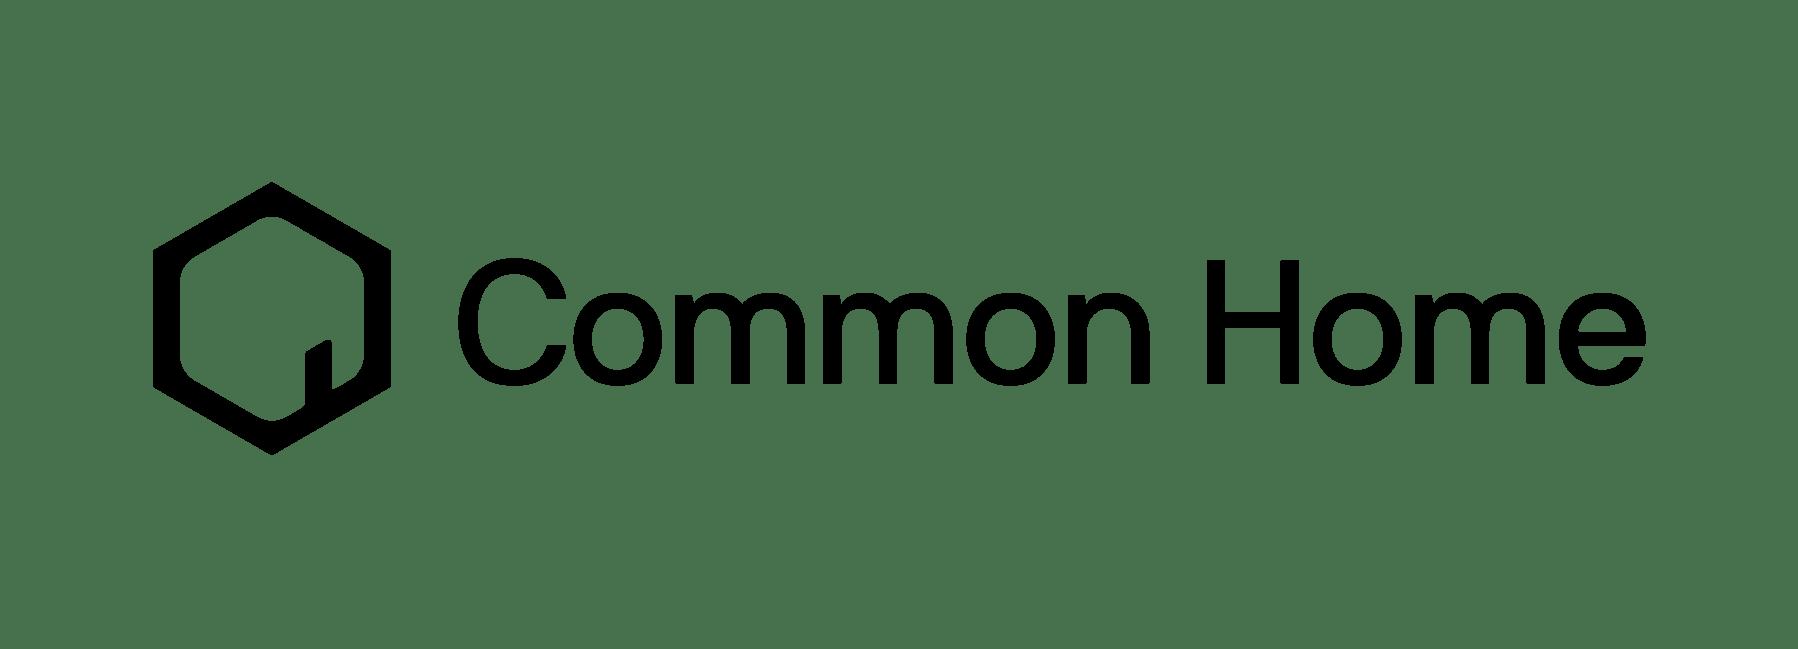 Common Home